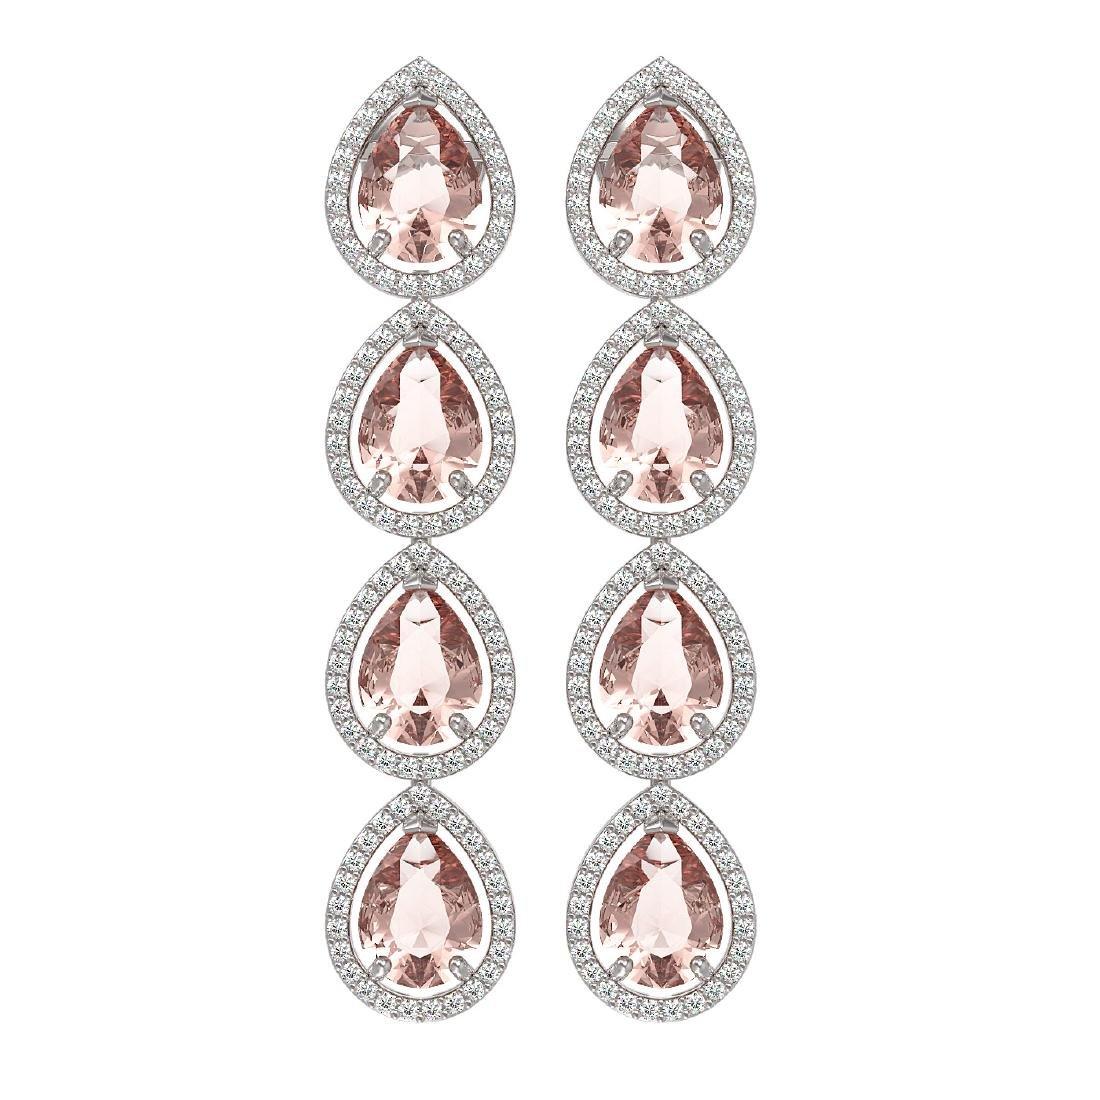 10.4 CTW Morganite & Diamond Halo Earrings 10K White